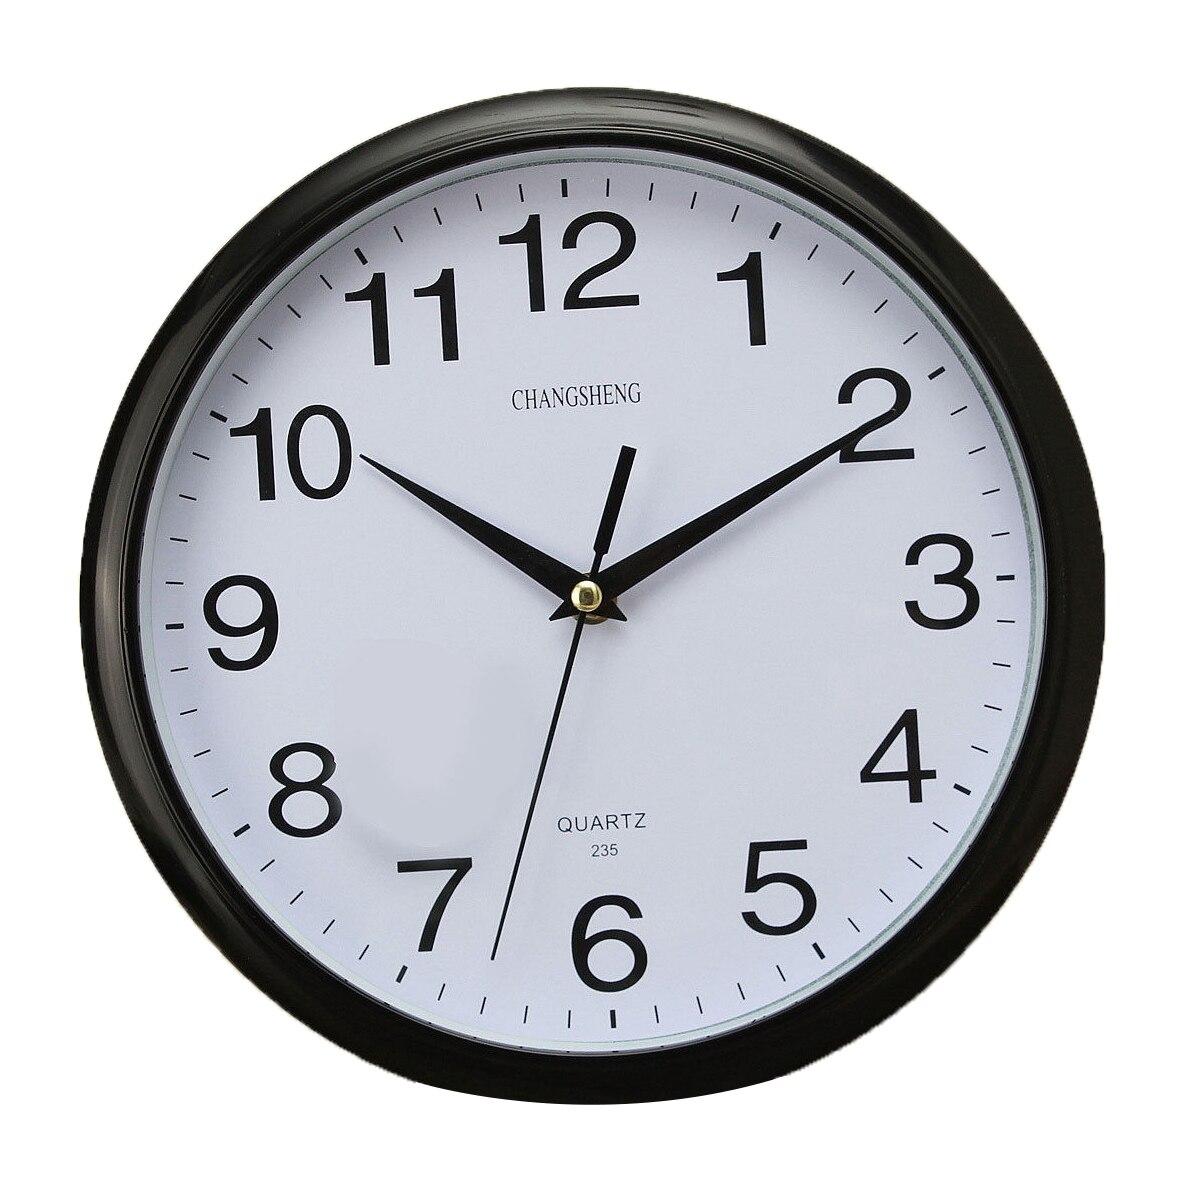 Best Large Vintage Round Modern Home Bedroom Retro Time Kitchen Wall Clock Quartz